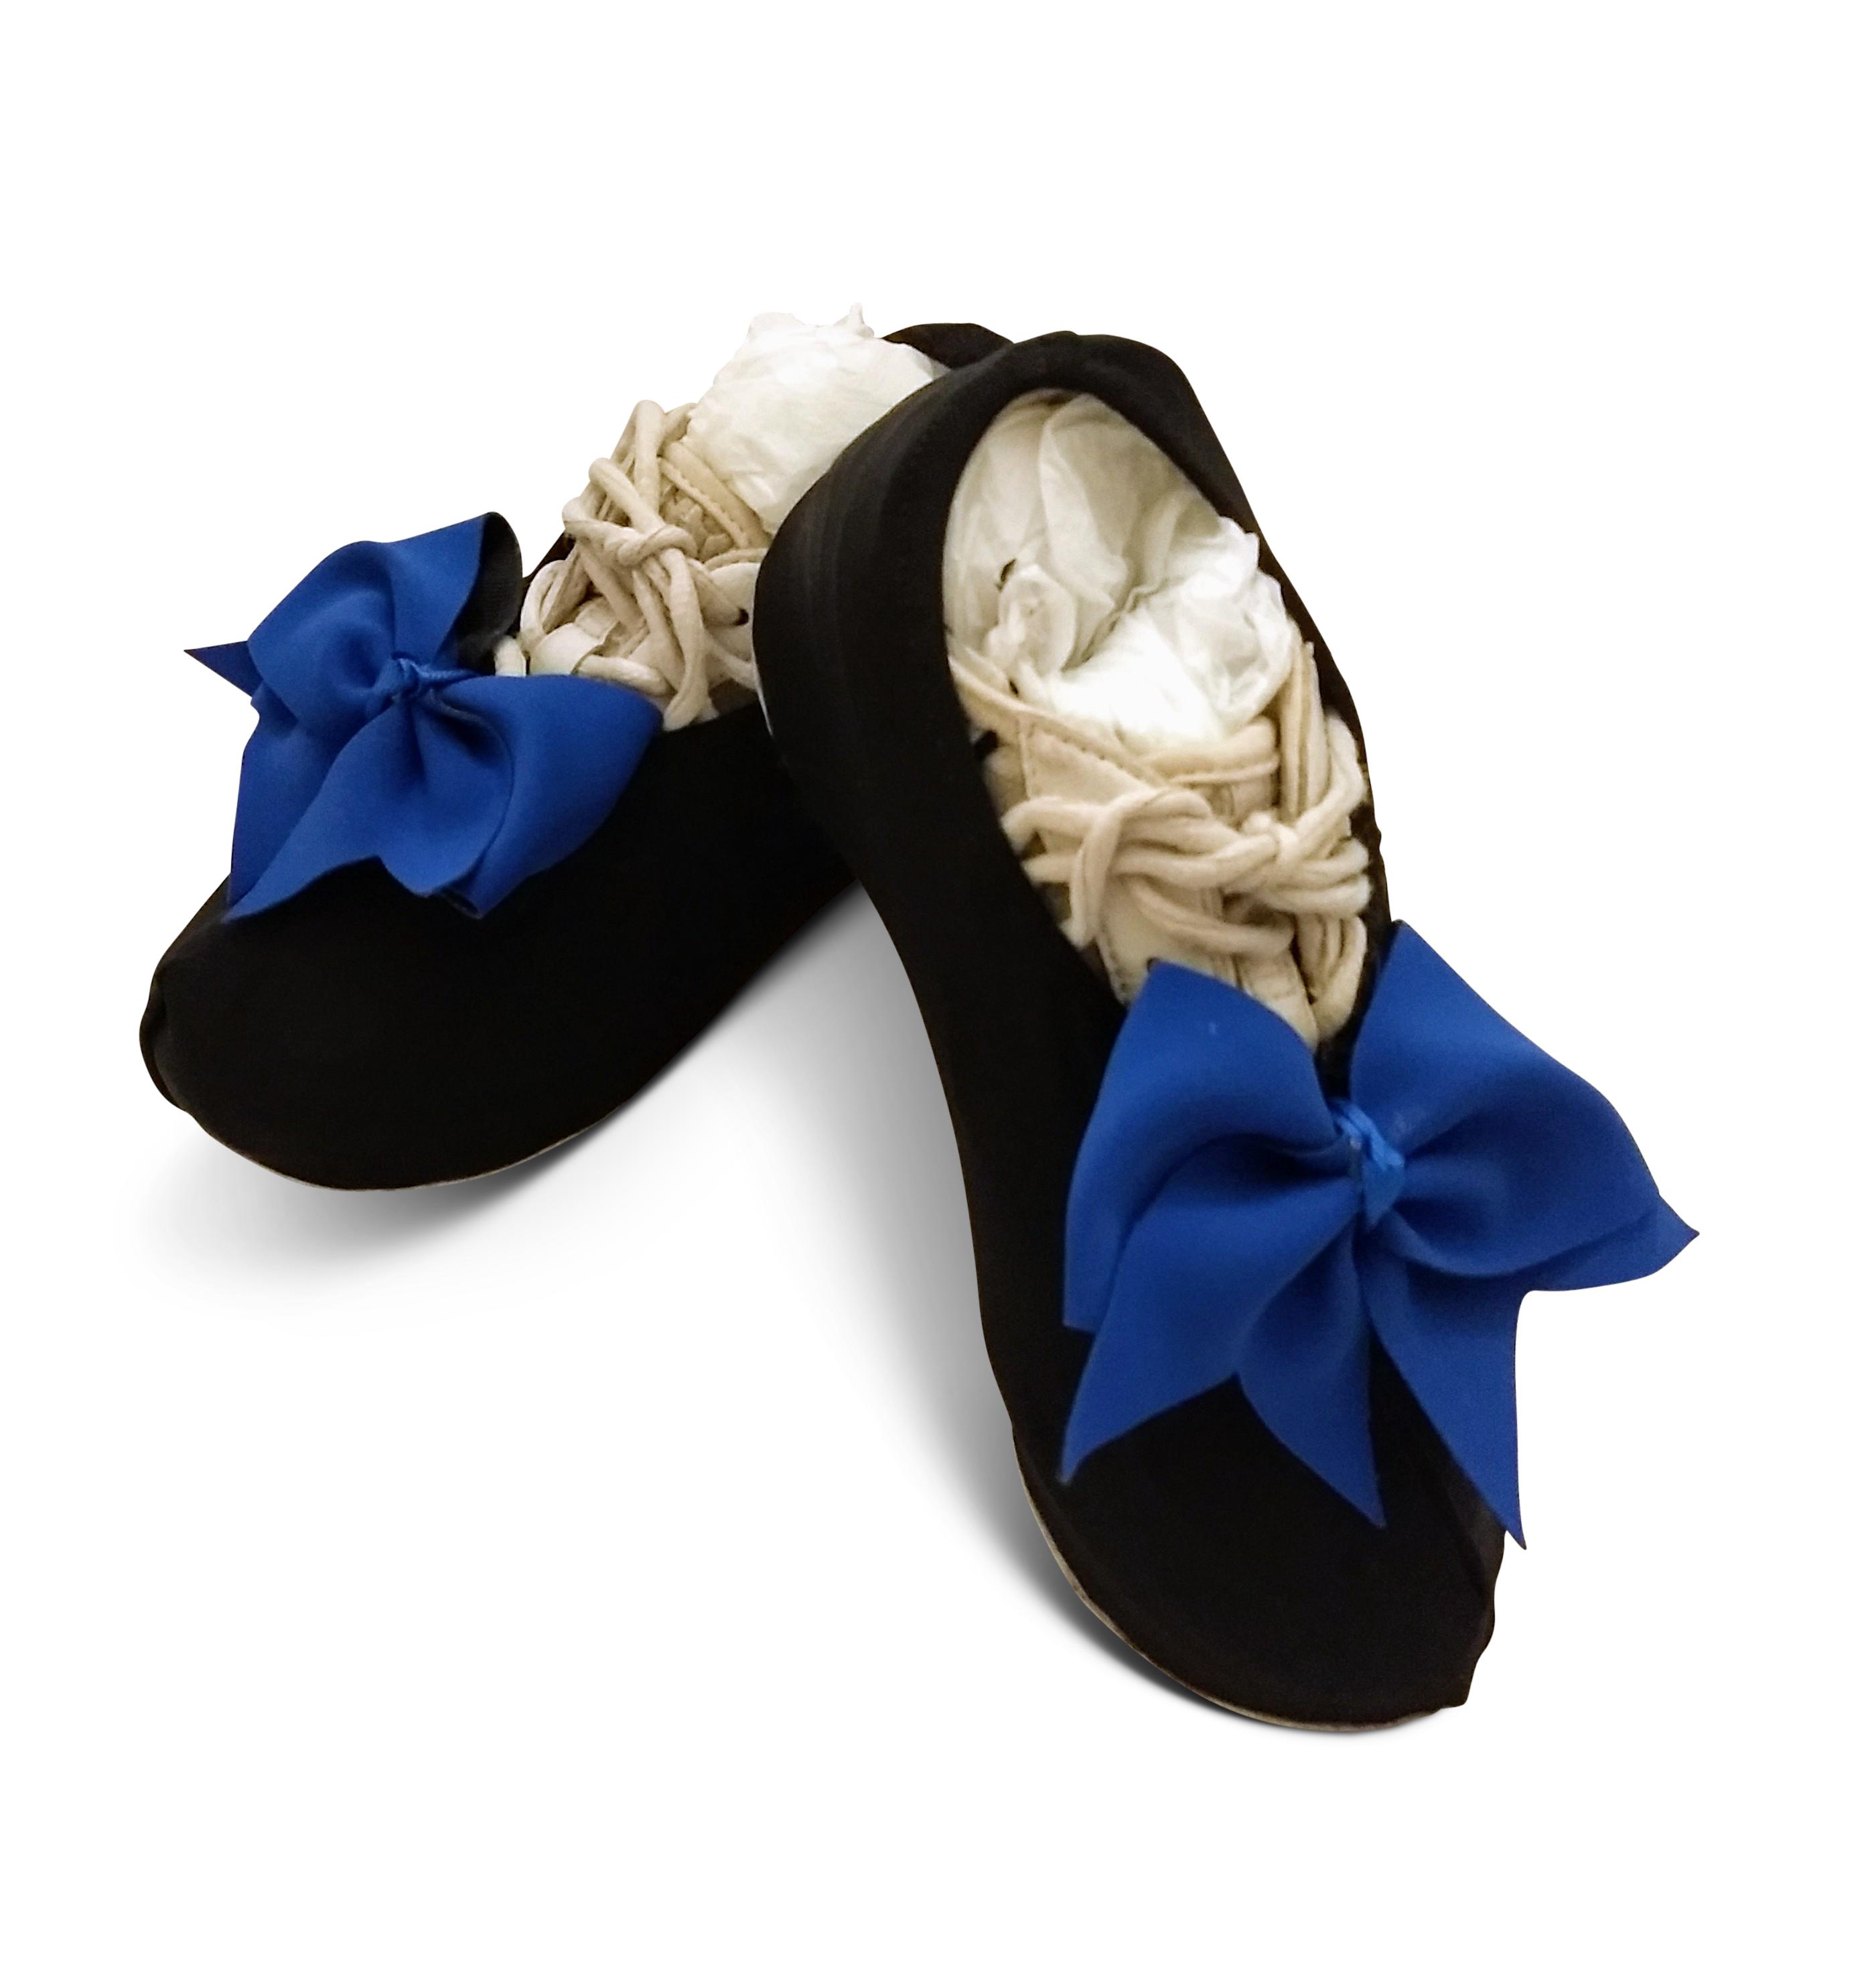 Basic Black Shouter Wear Cheer Shoe Covers SW-BLK